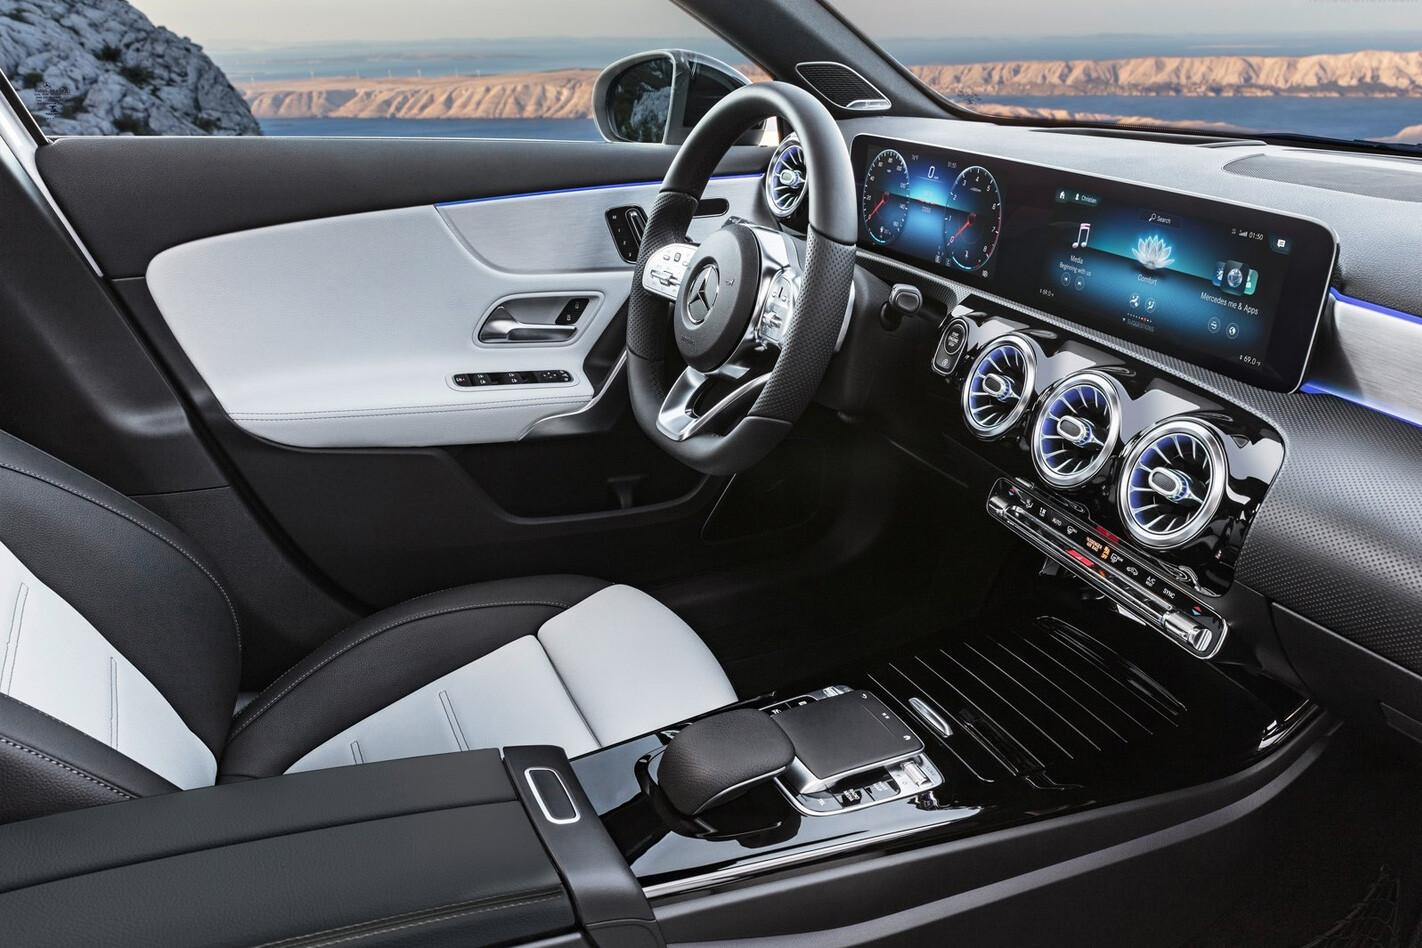 Mercedes A Class Interior Profile Jpg